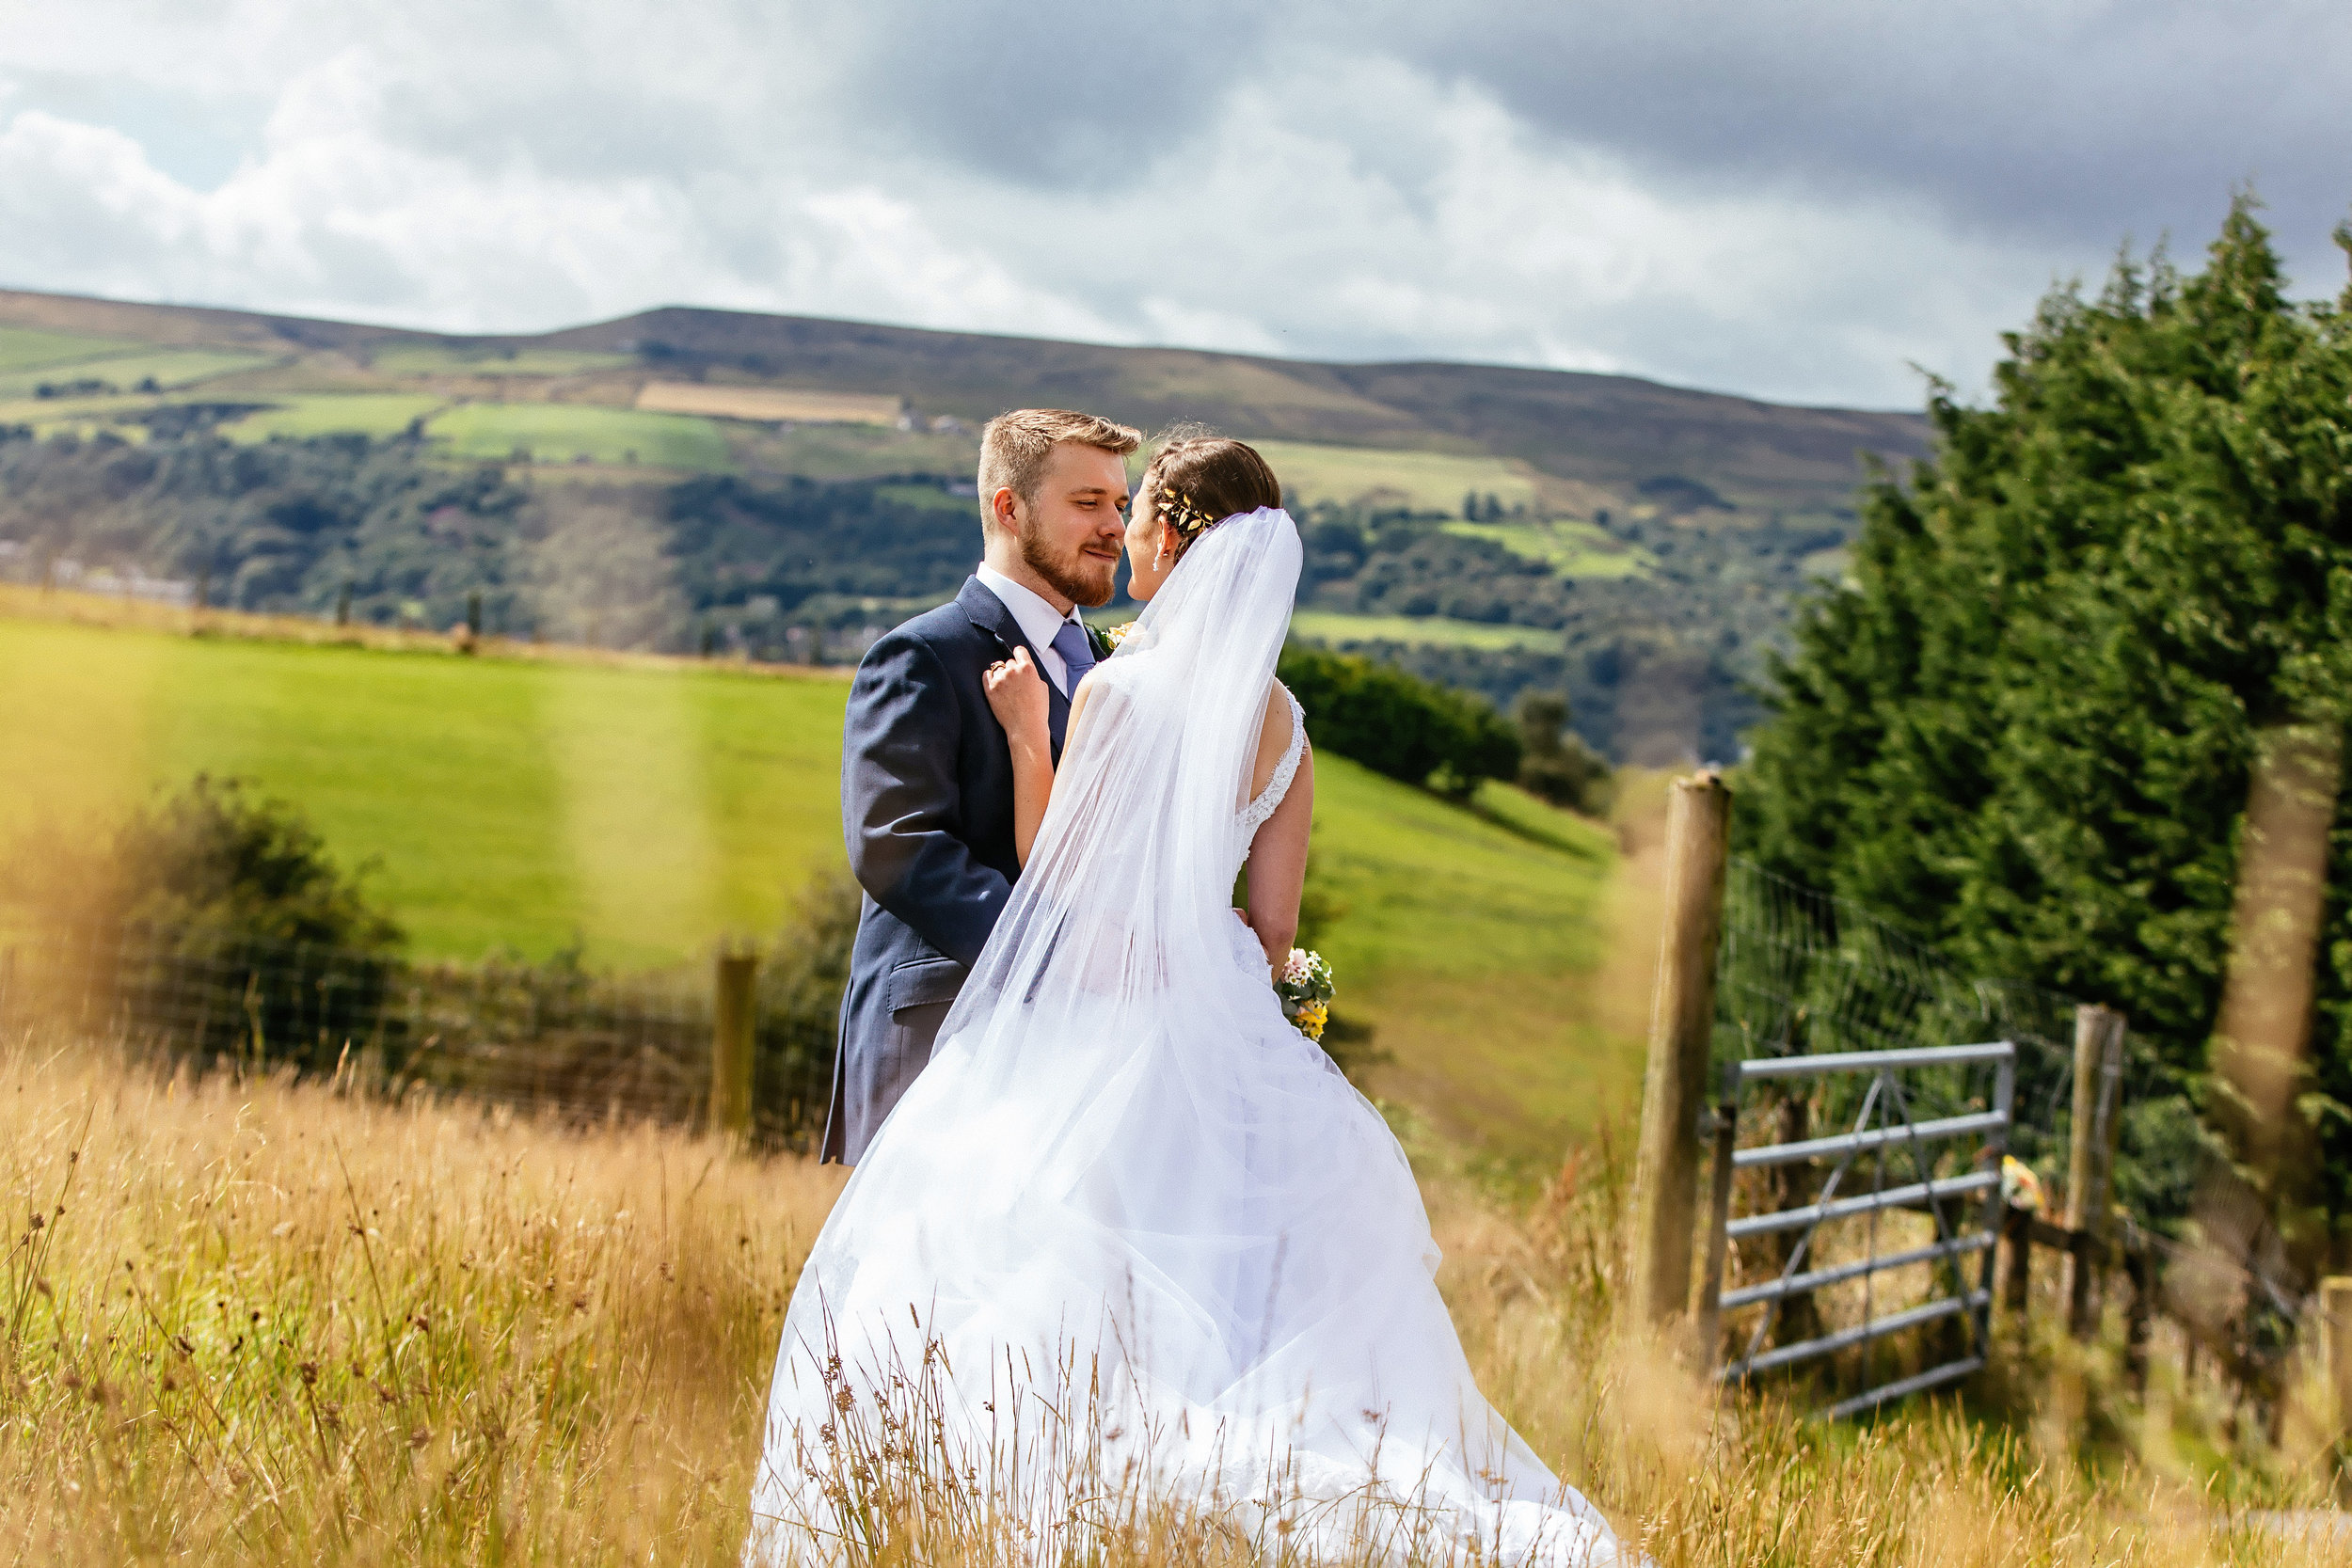 Kathryn-and-Mike-Wedding-Highlights-68.jpg